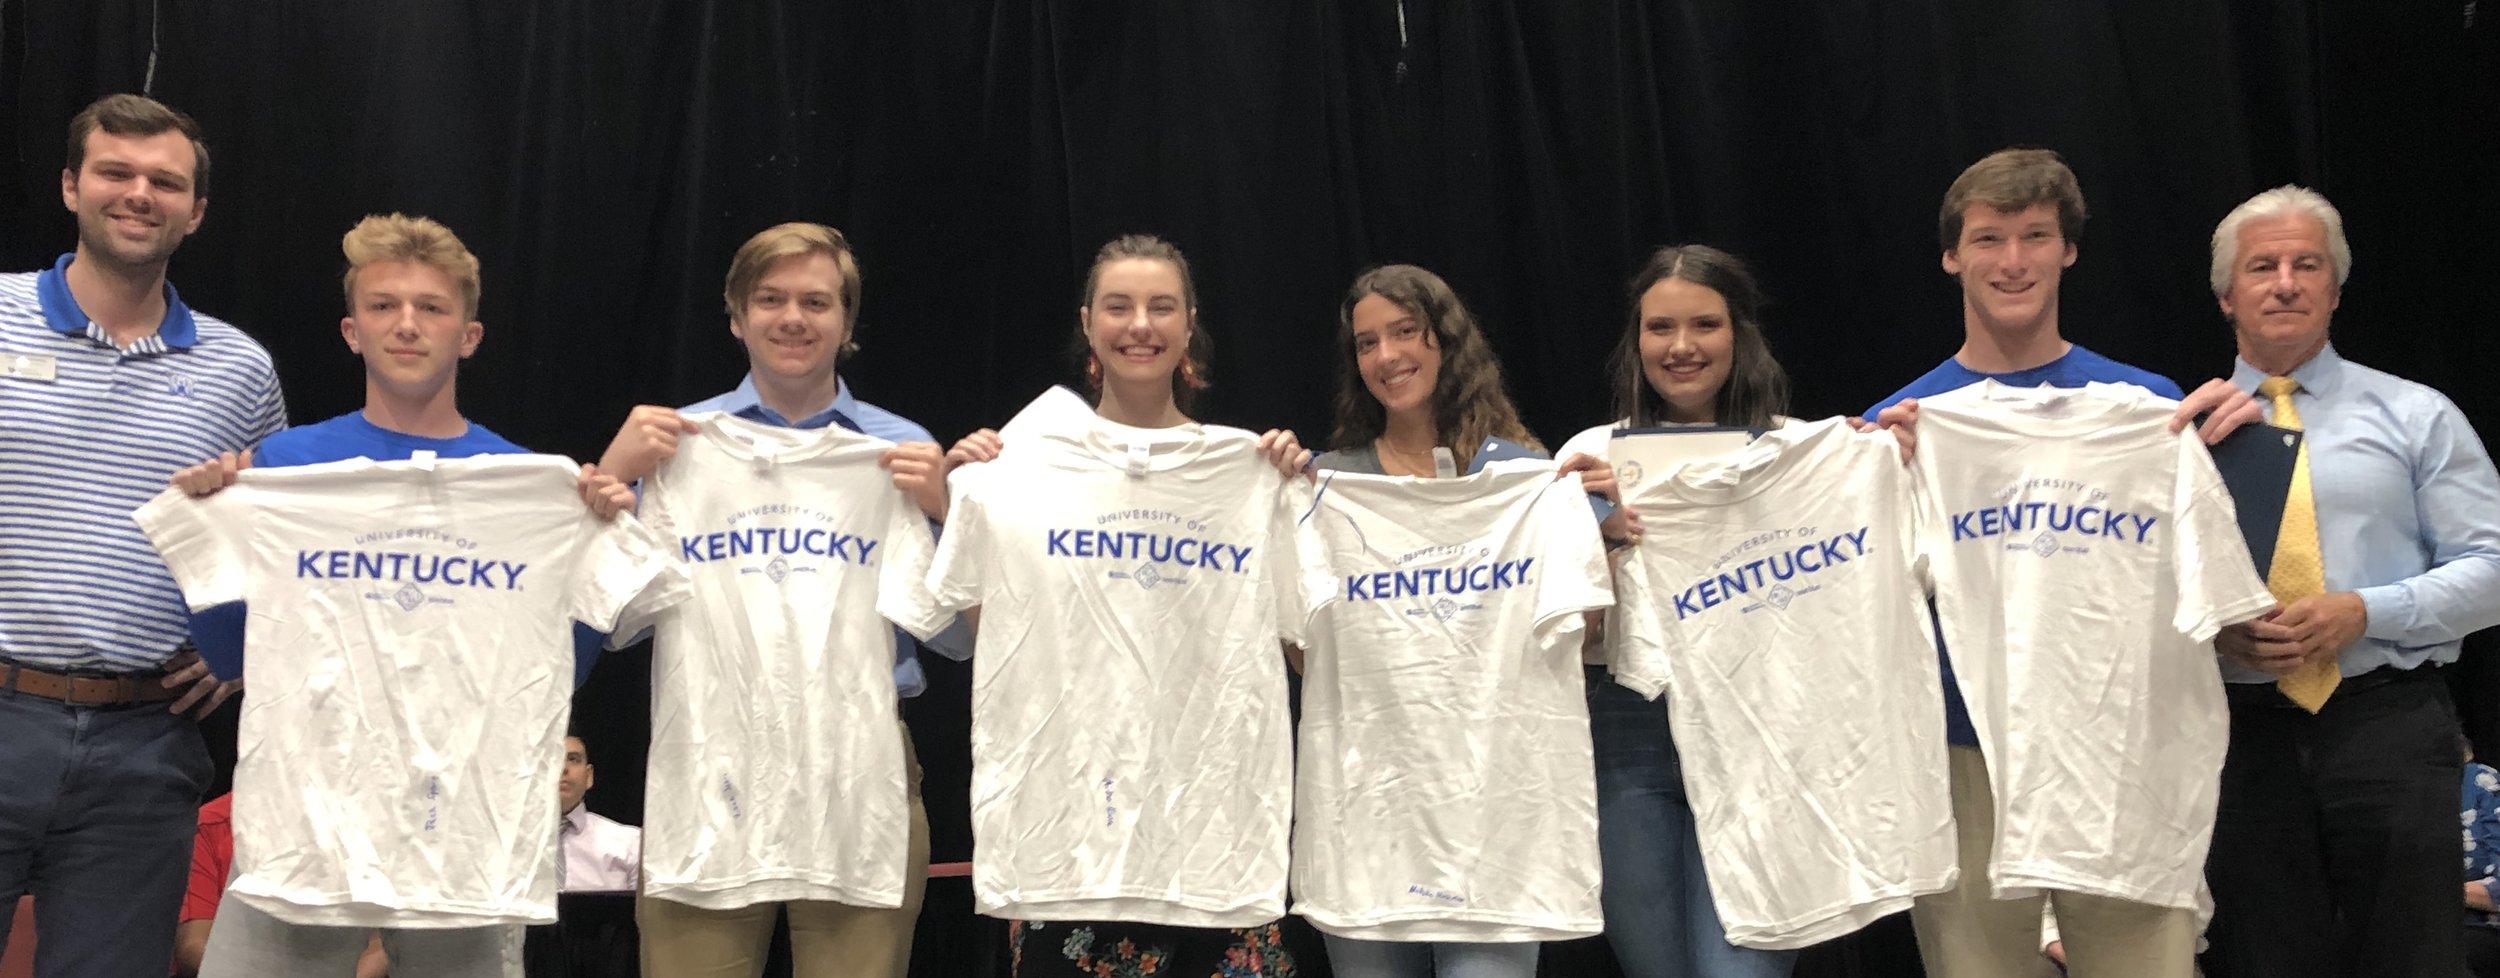 University of Kentucky.jpg